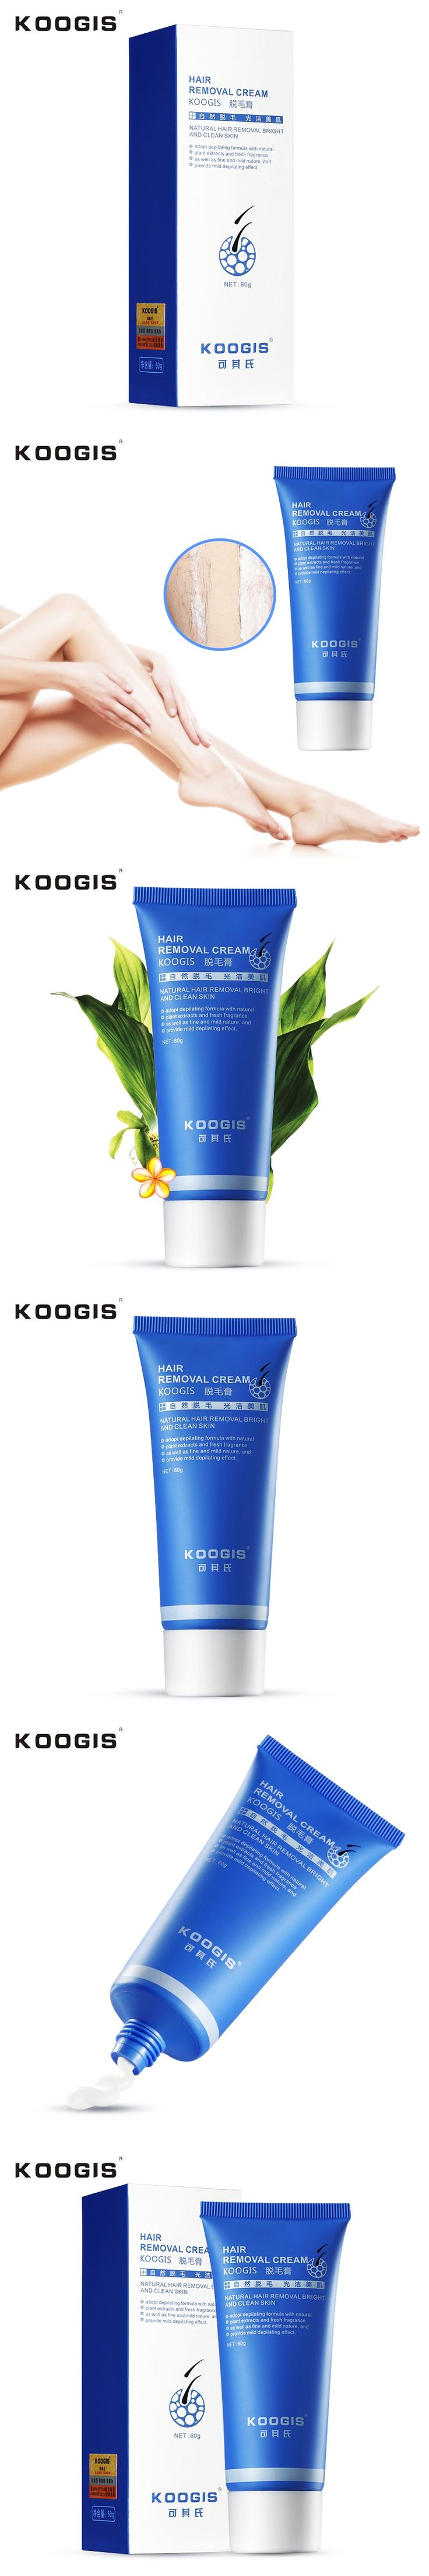 KOOGIS Depilatory Paste speediness hair removal cream for Boby Leg Pubic Hair Armpit Pudendal Epilation Depilatory PasteKOOGIS1